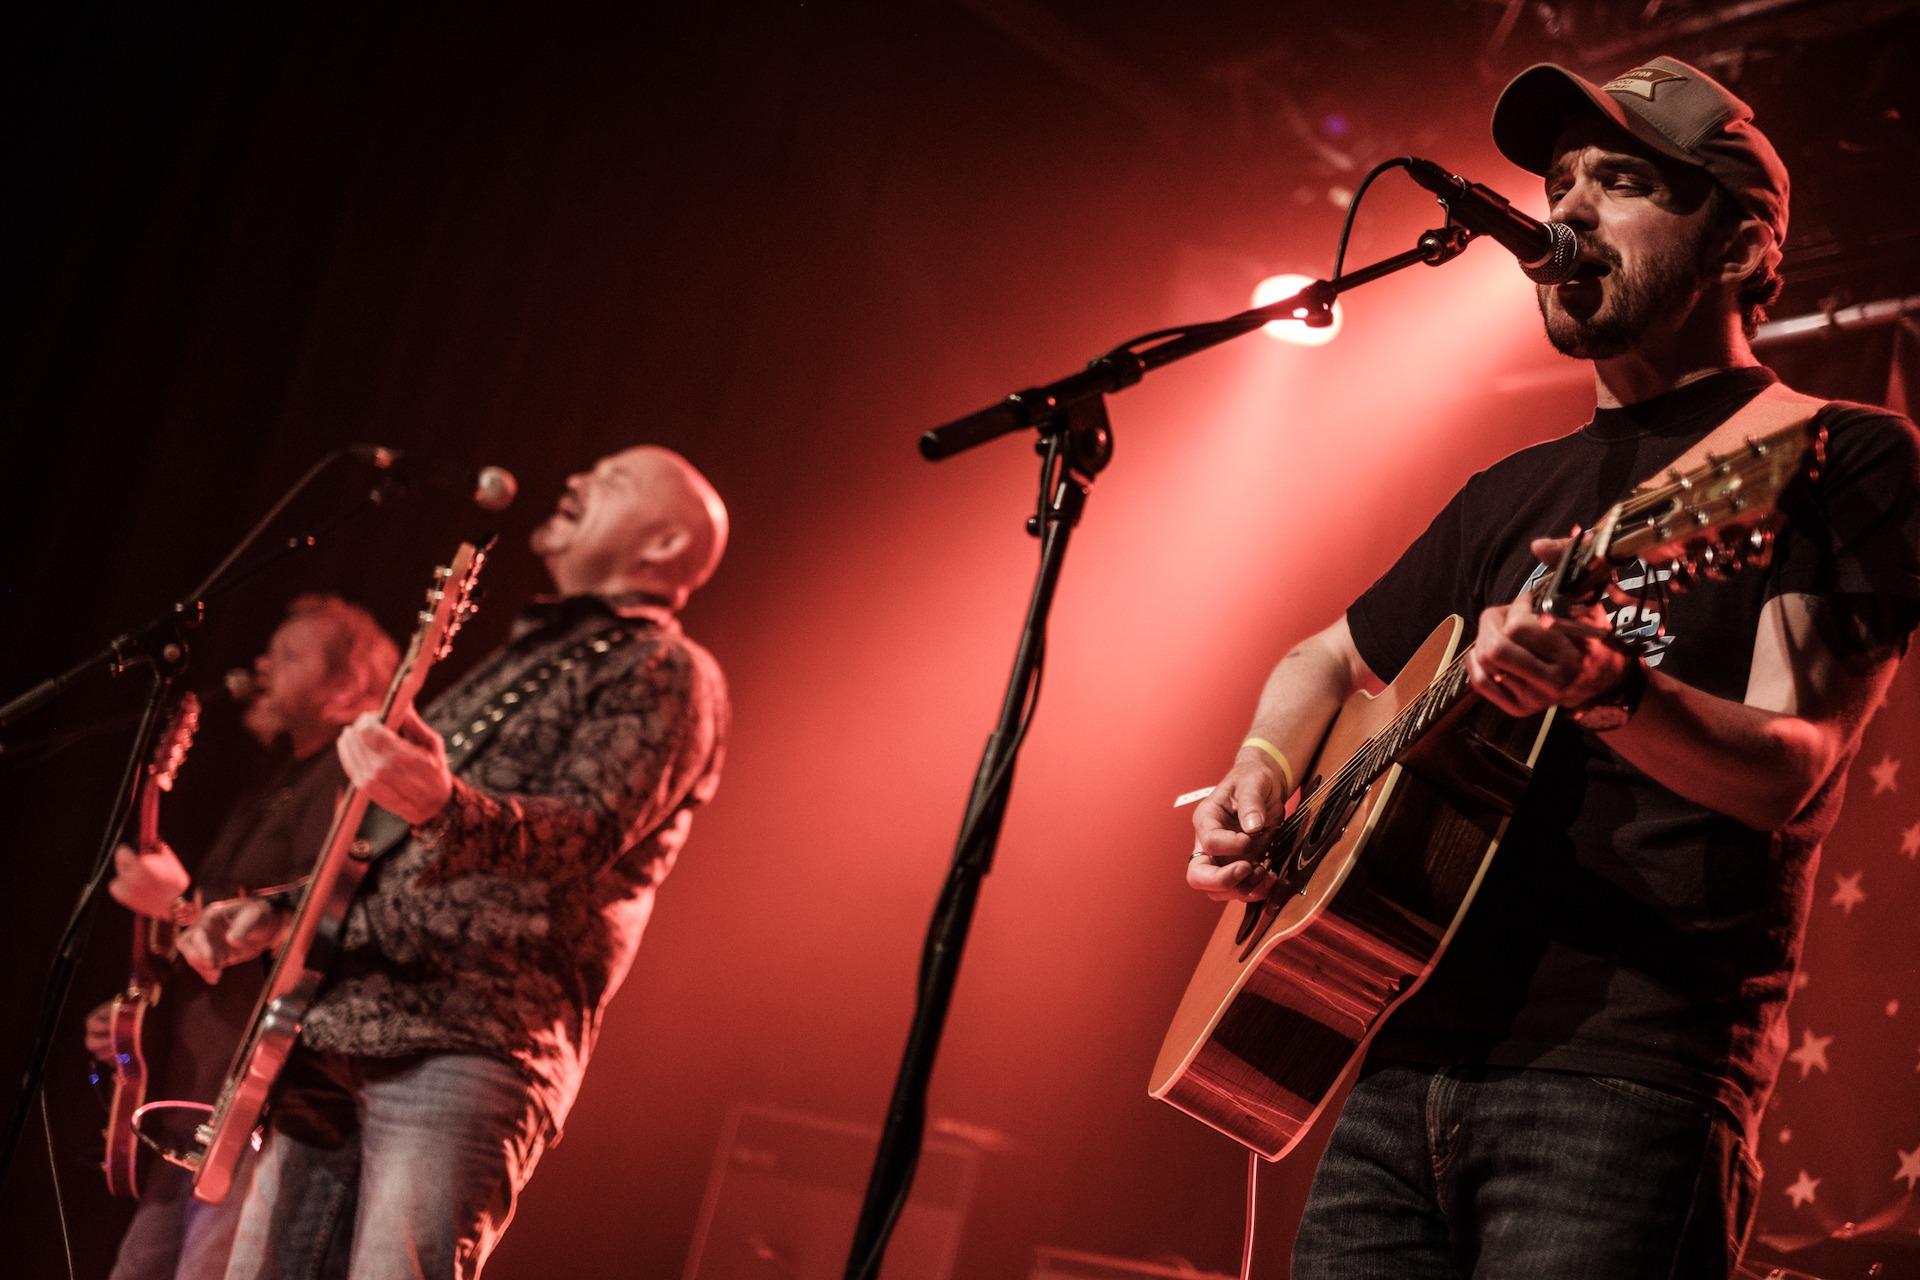 SRF 2016 - The Wynntown Marshals - Iain Sloan, Murdoch McLeod, Keith Benzie, Static Roots Festival 2016